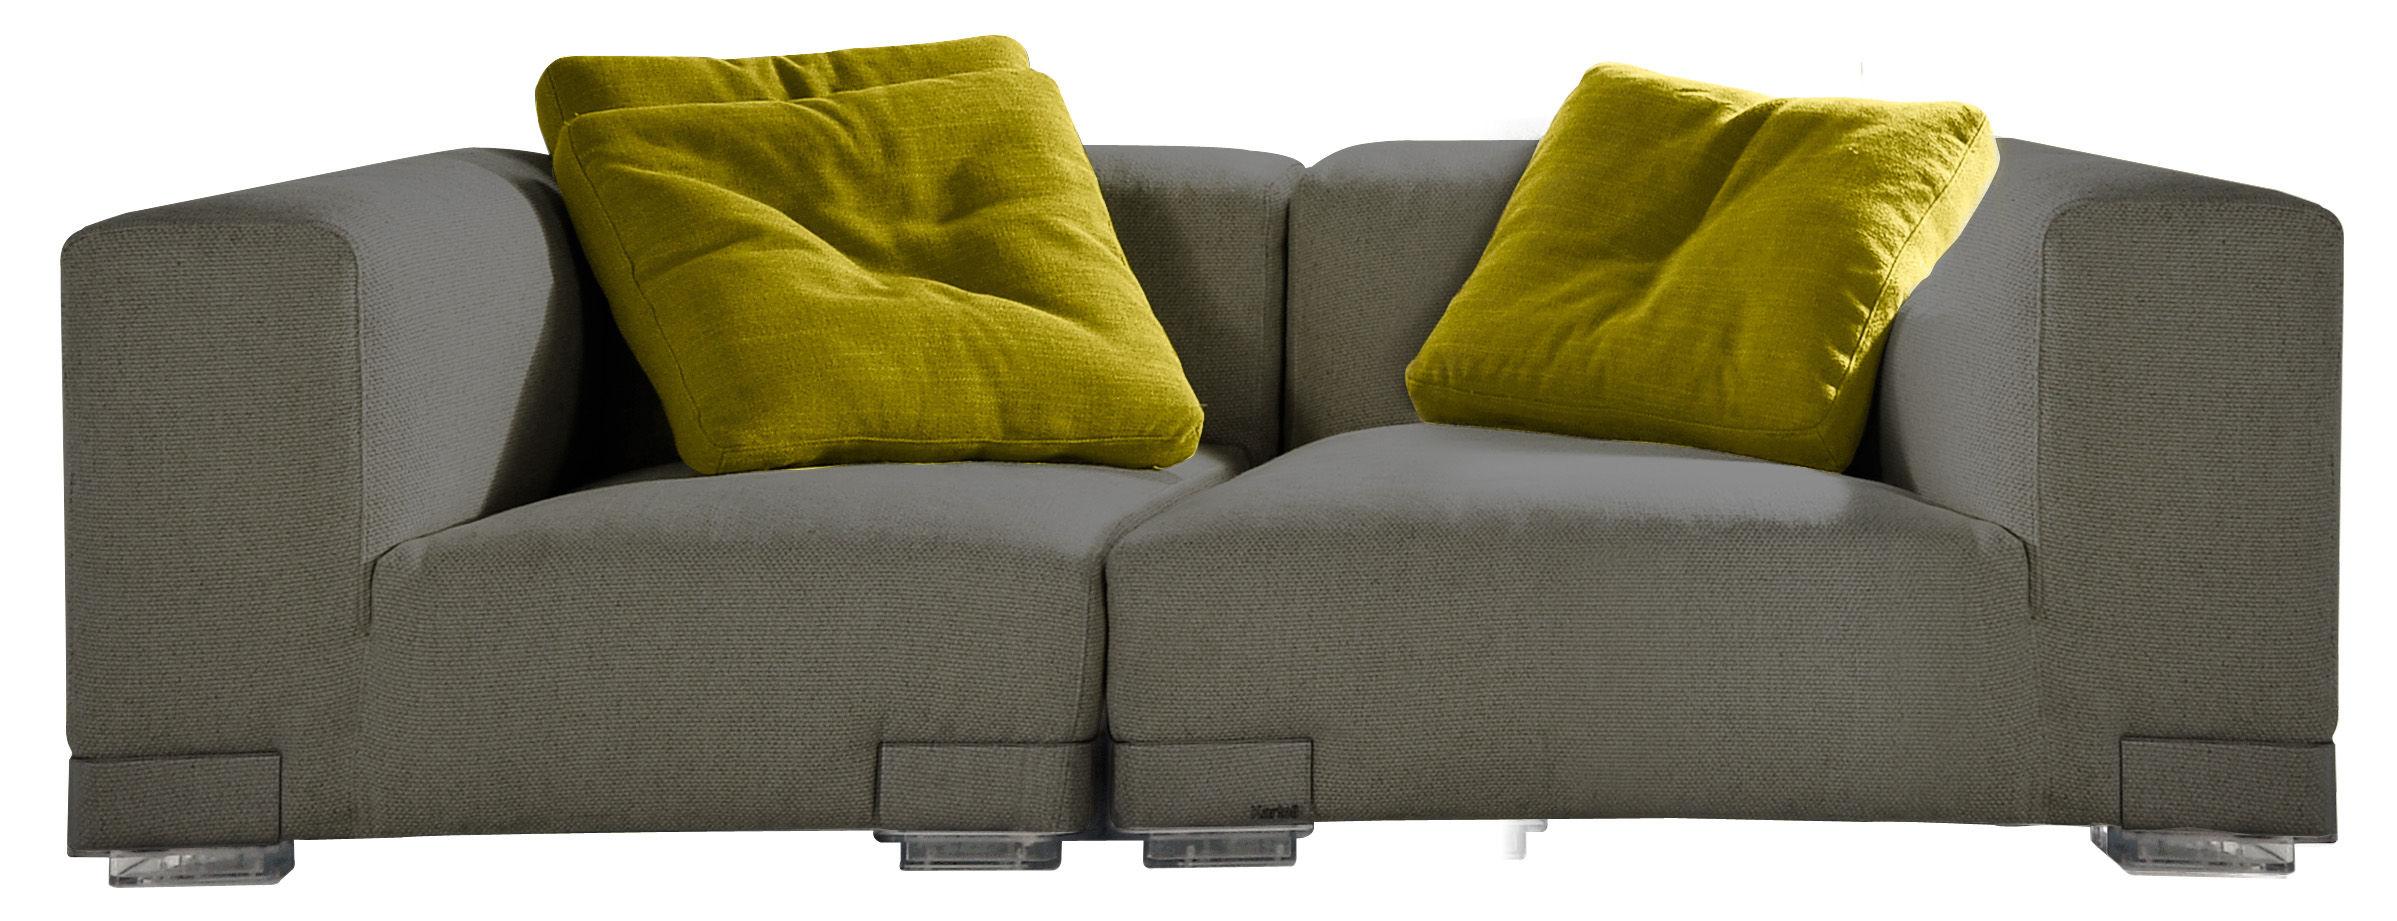 Möbel - Sofas - Plastics Duo Sofa Komposition Nr. 2 - Kartell - Grau - Gewebe, Polykarbonat